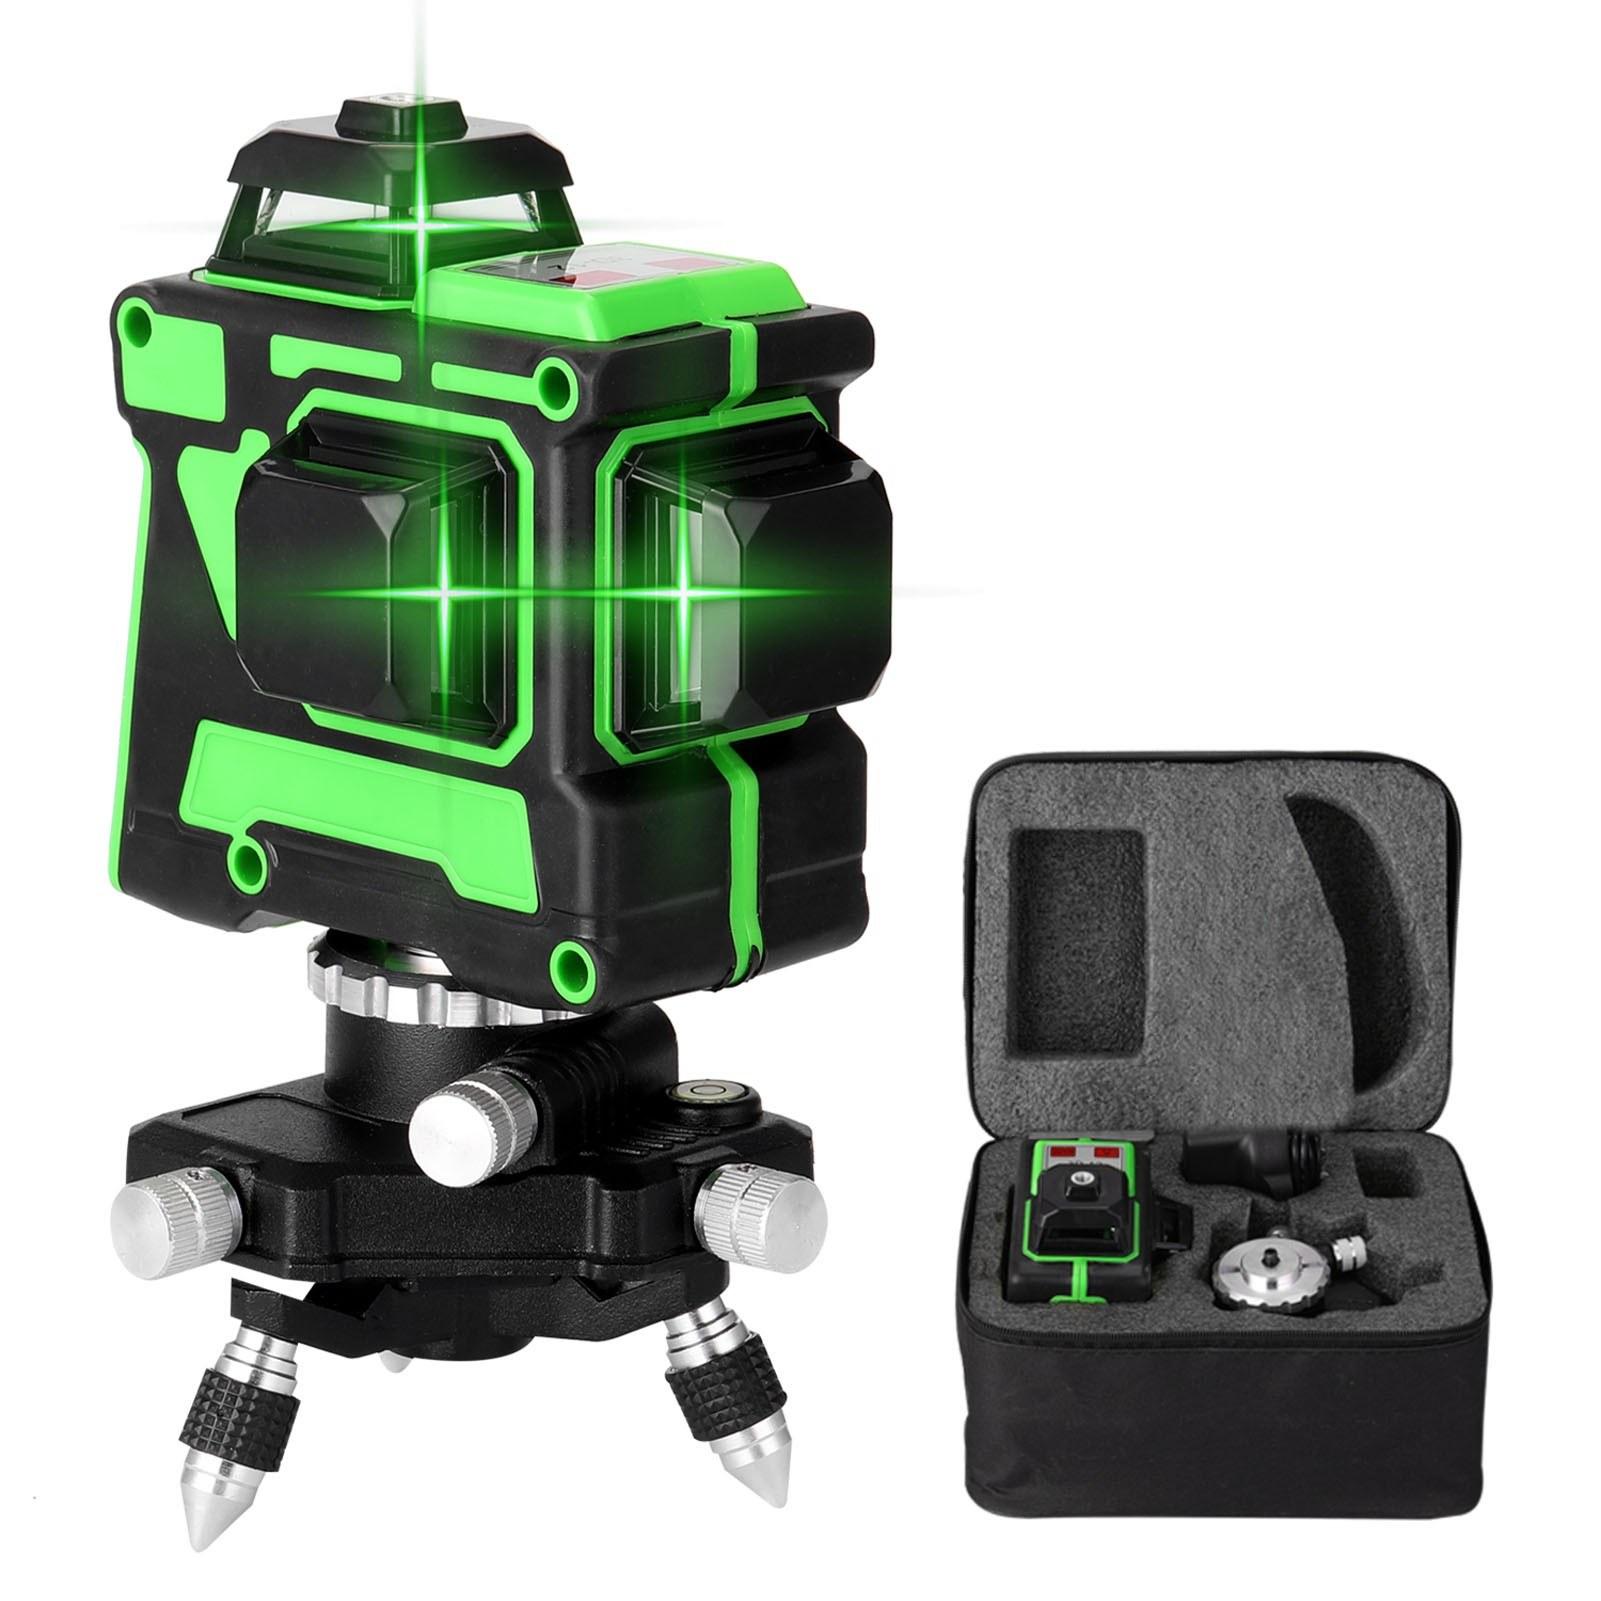 TomTop - [EU Warehouse] 41% OFF KKmoon Multifunctional 3D 12 Lines Laser Level Tool, $51.99 (Inclusive of VAT)